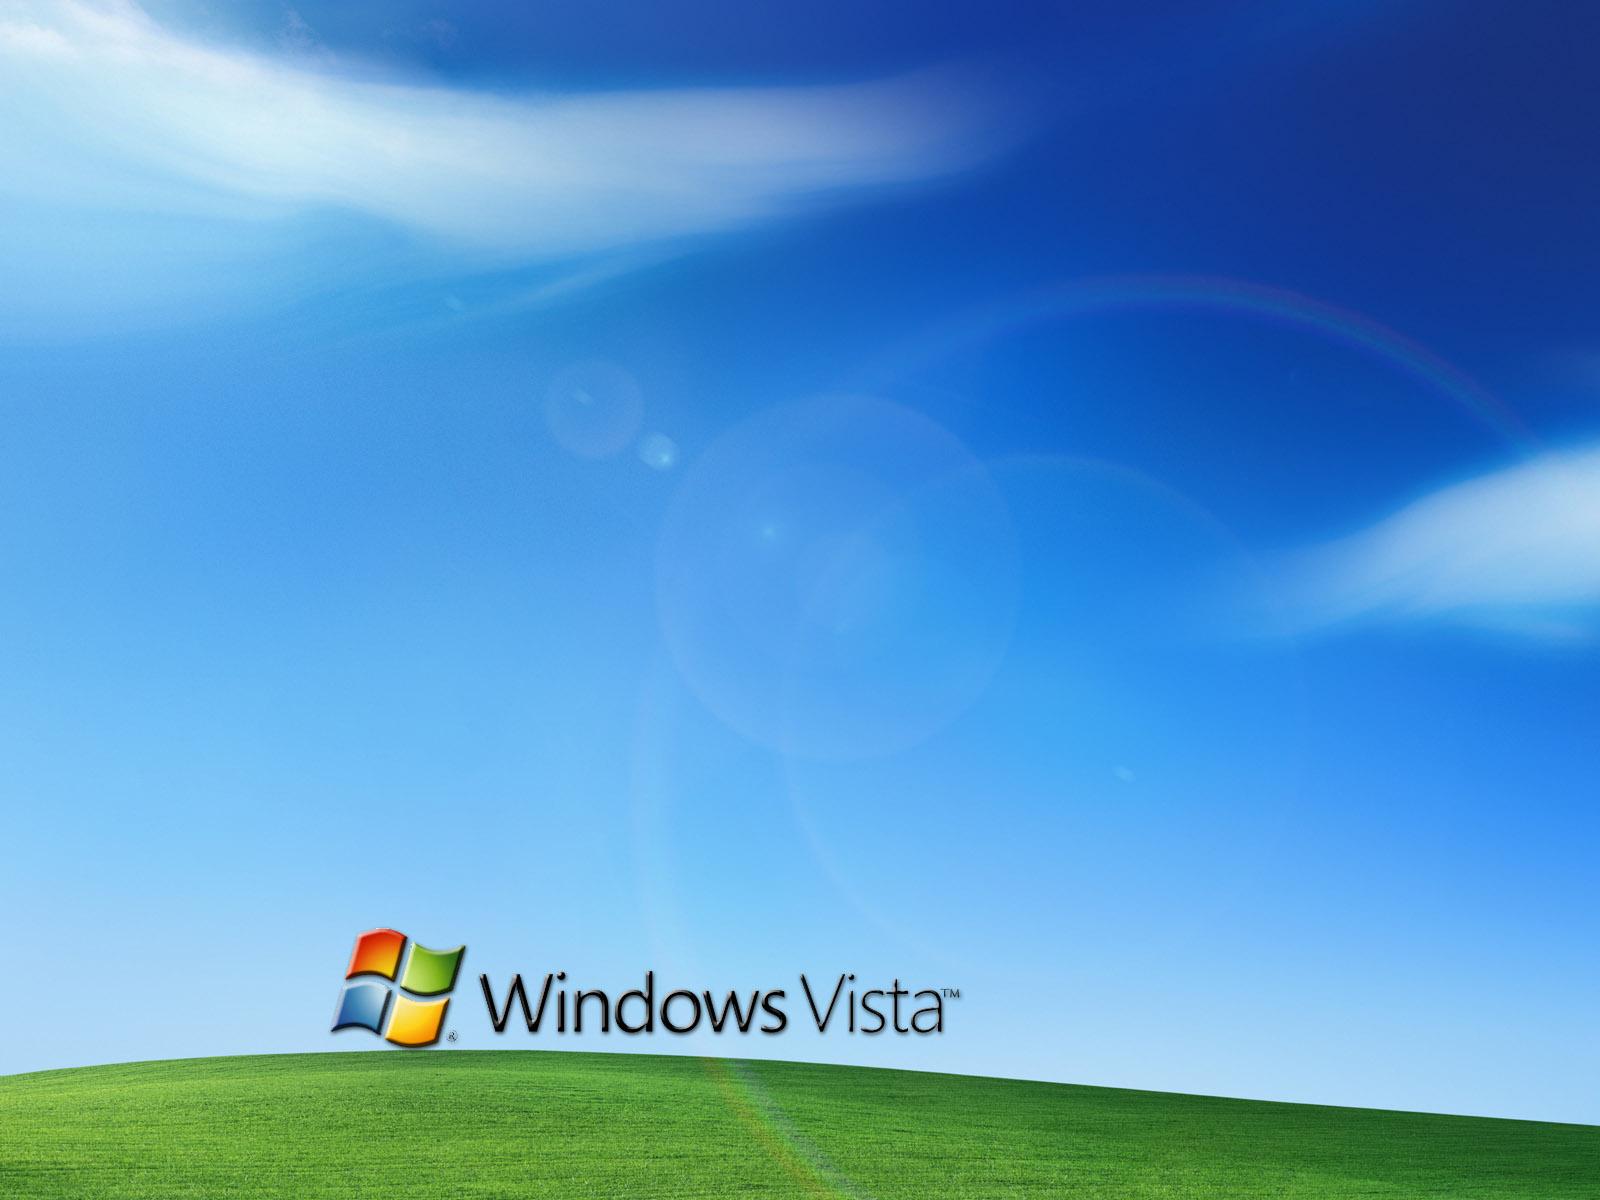 Windows Vista Wallpaper And Background Image